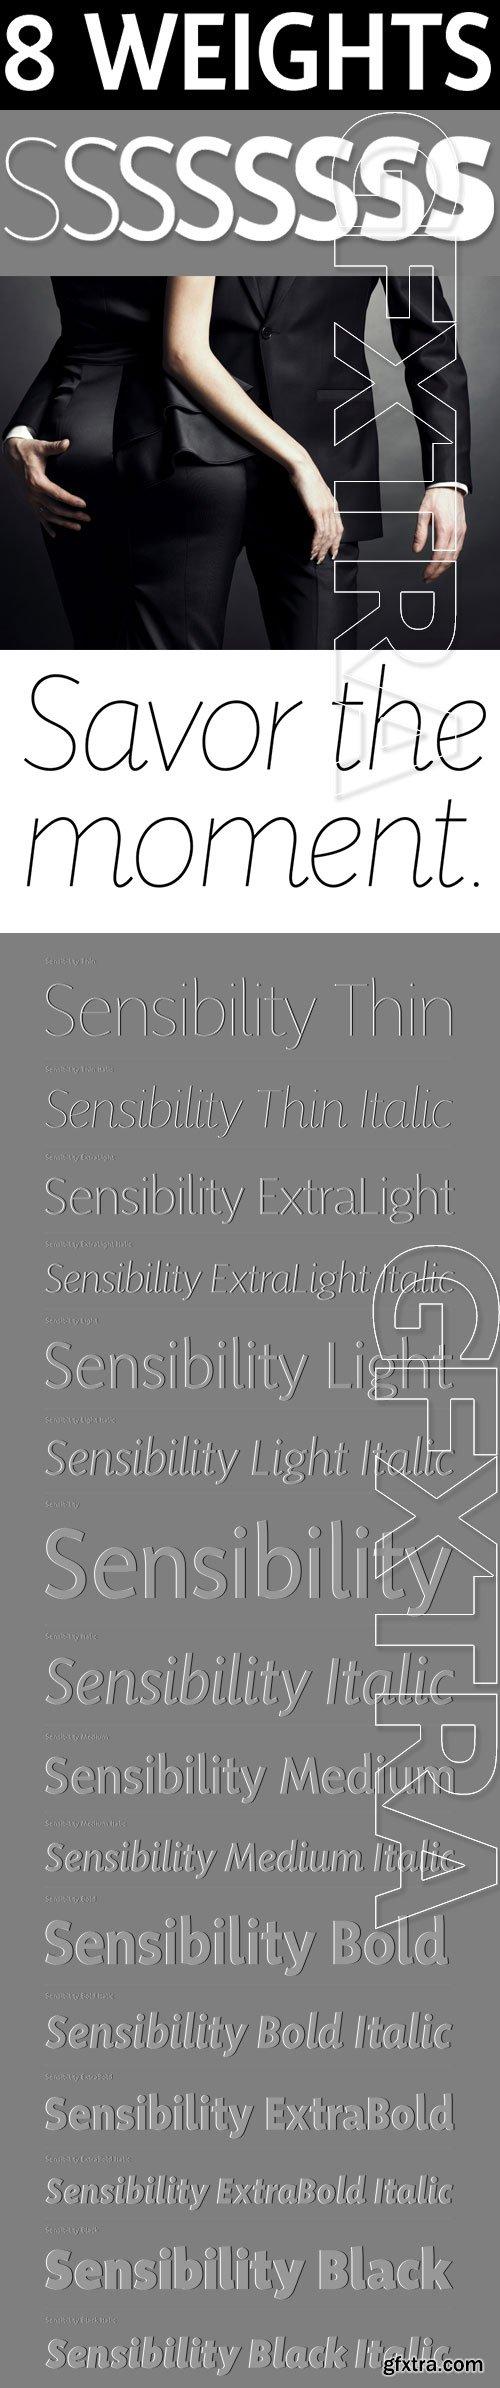 Sensibility - Humanist Sans Serif Font Family 16xOTF $149